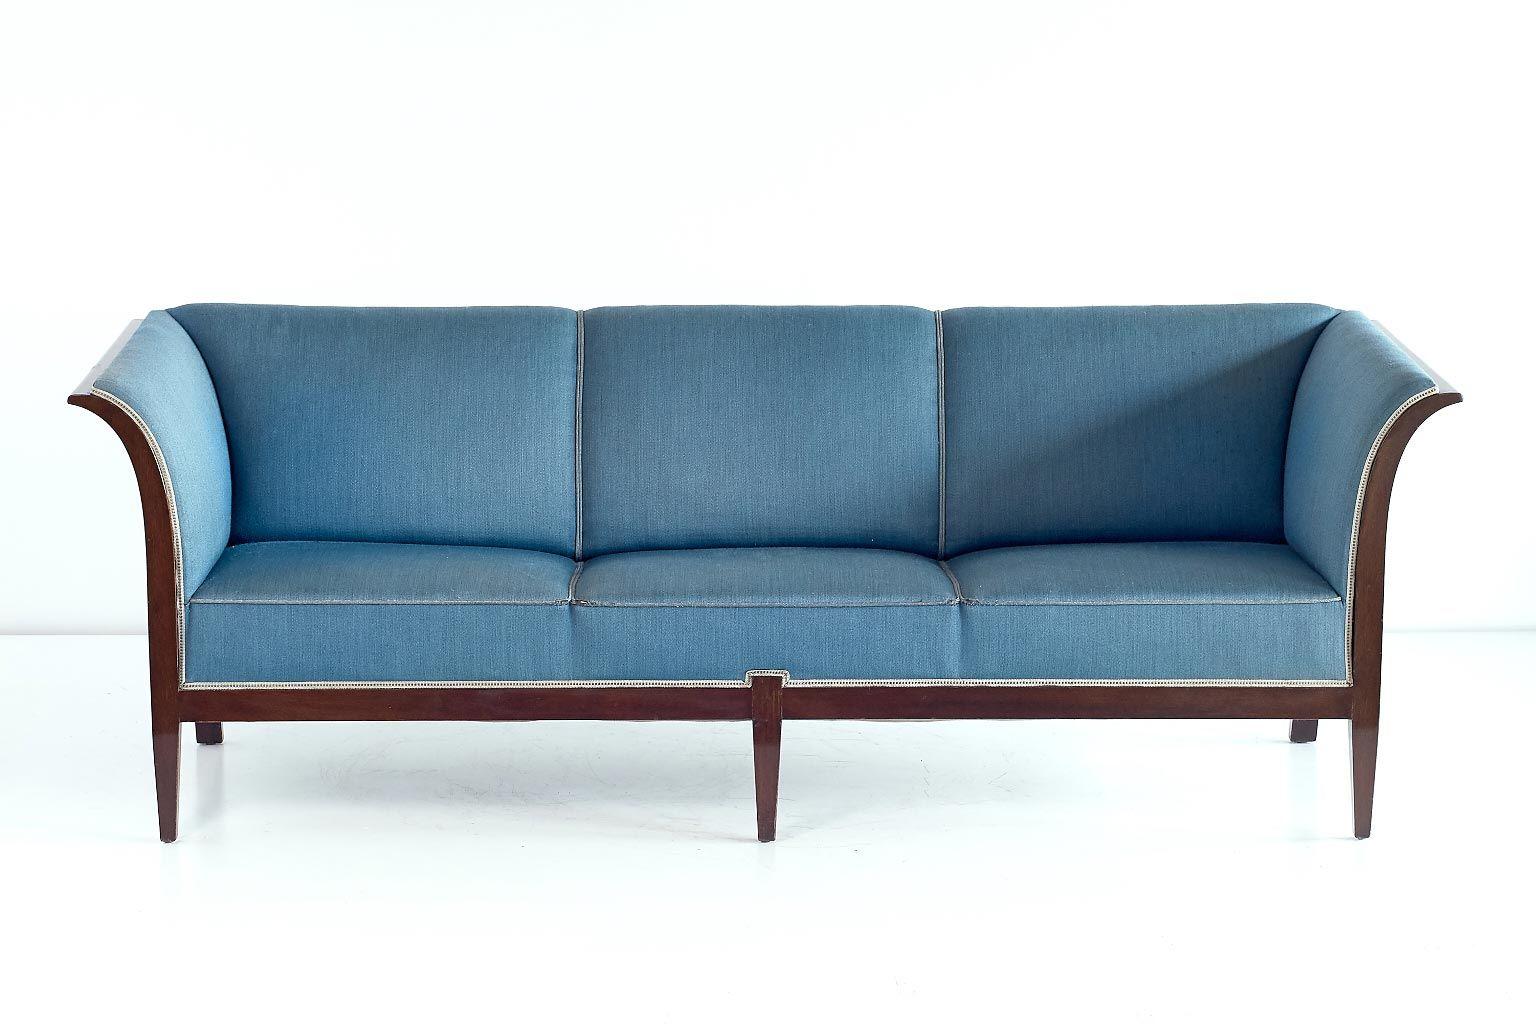 mahagoni sofa von frits henningsen 1940er bei pamono kaufen. Black Bedroom Furniture Sets. Home Design Ideas